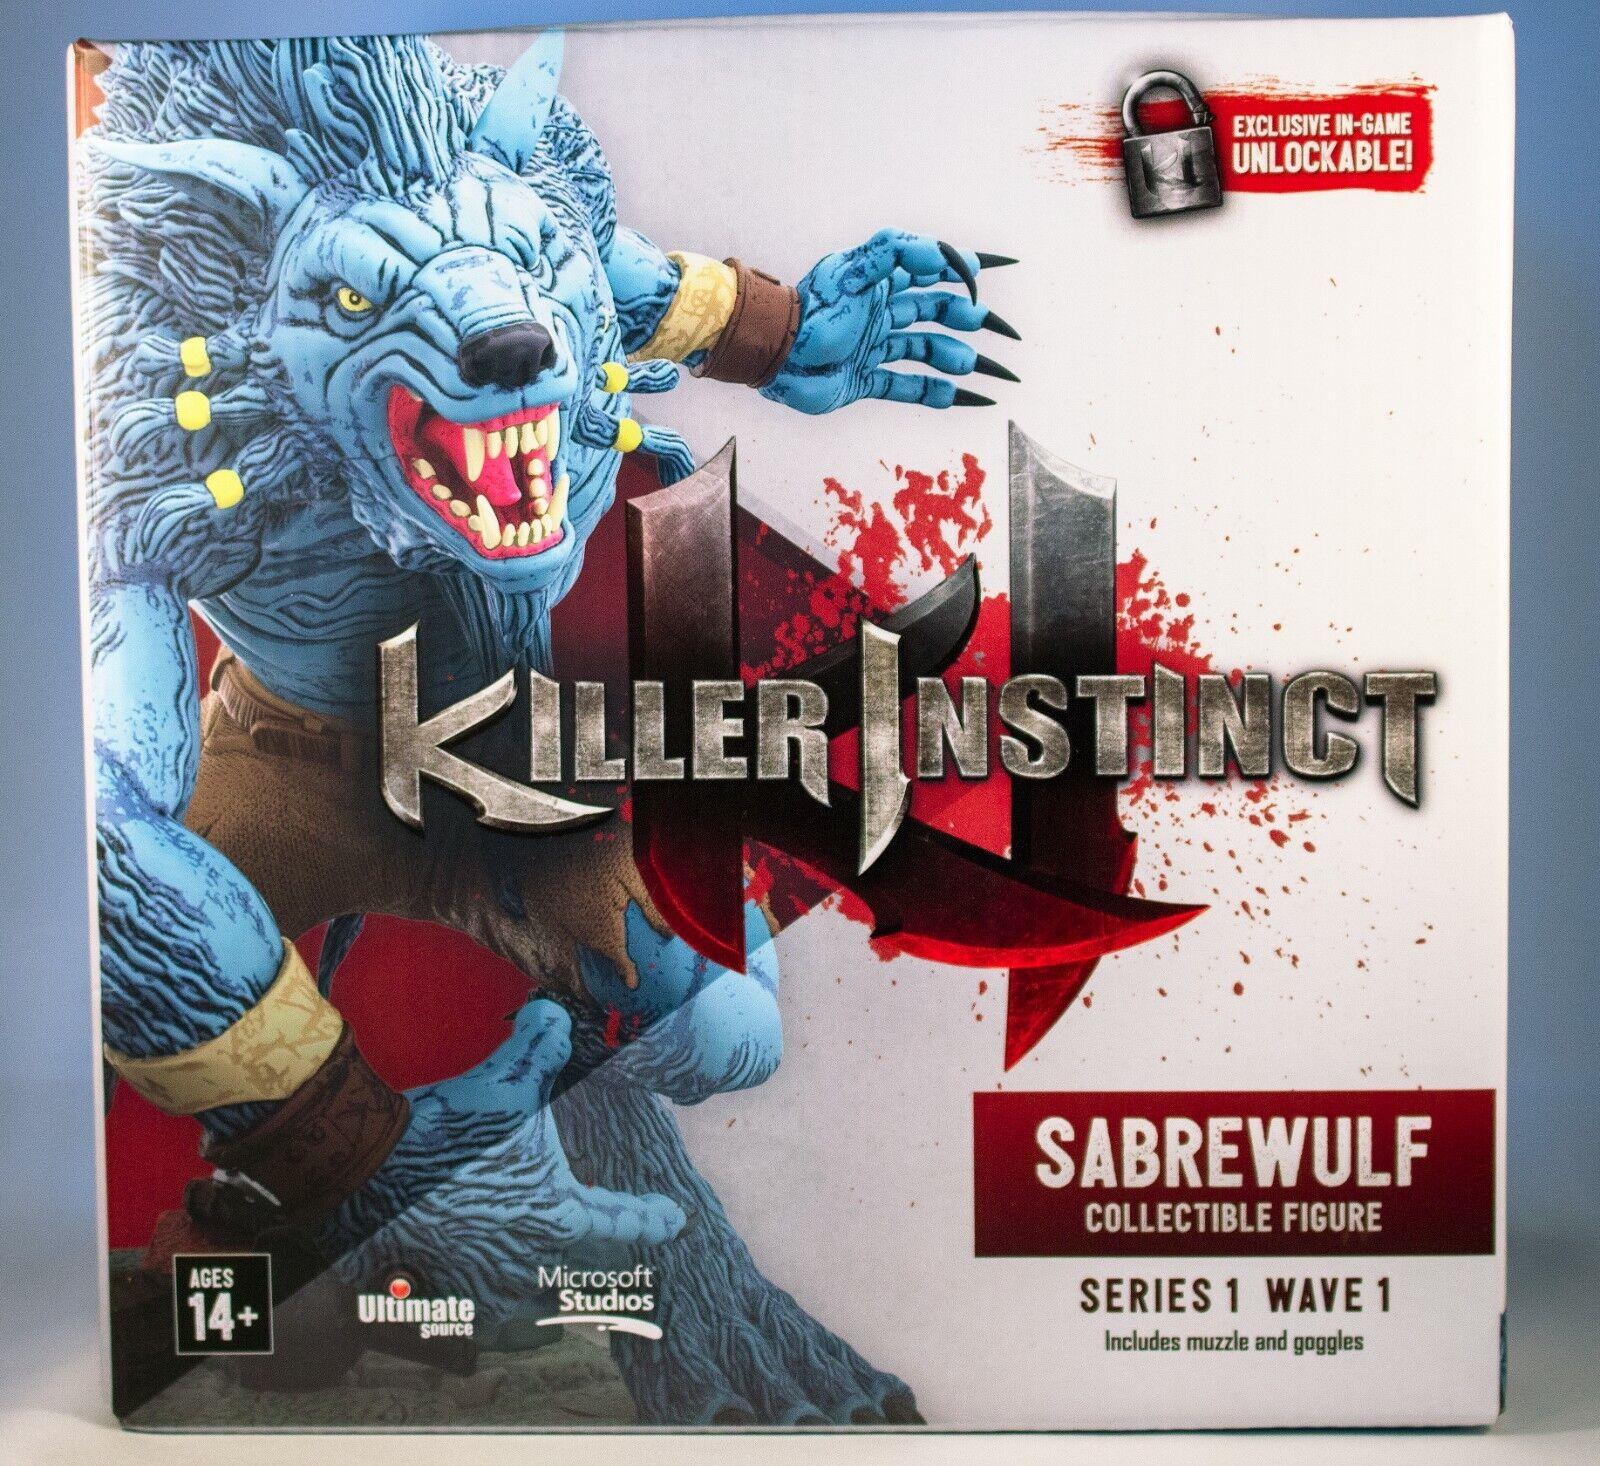 Ultimate Source Killer Instinct 6 Inch Figure Saberwulf For Sale